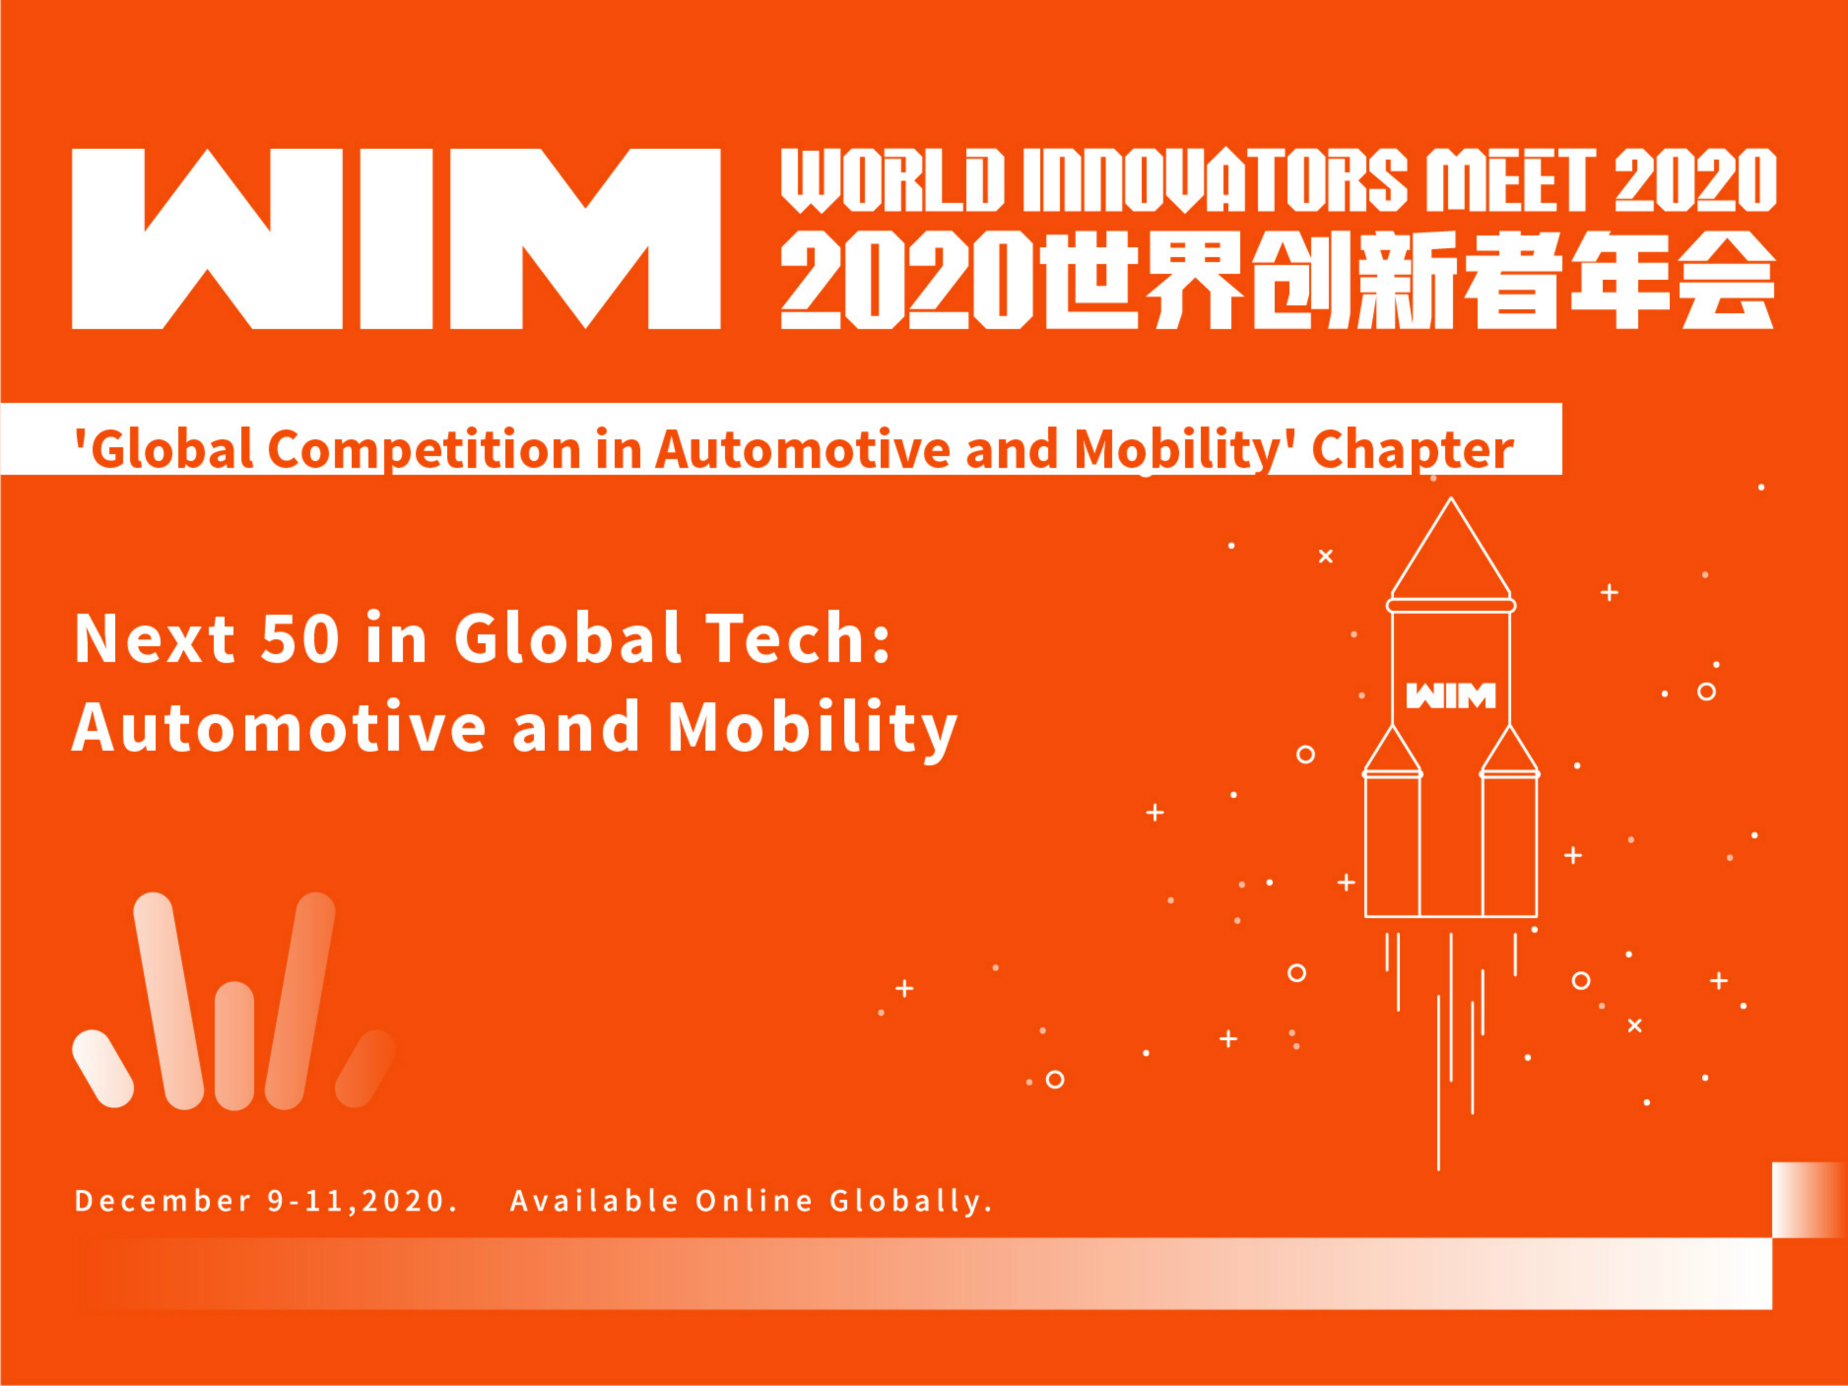 Next 50 in Global Tech: Automotive